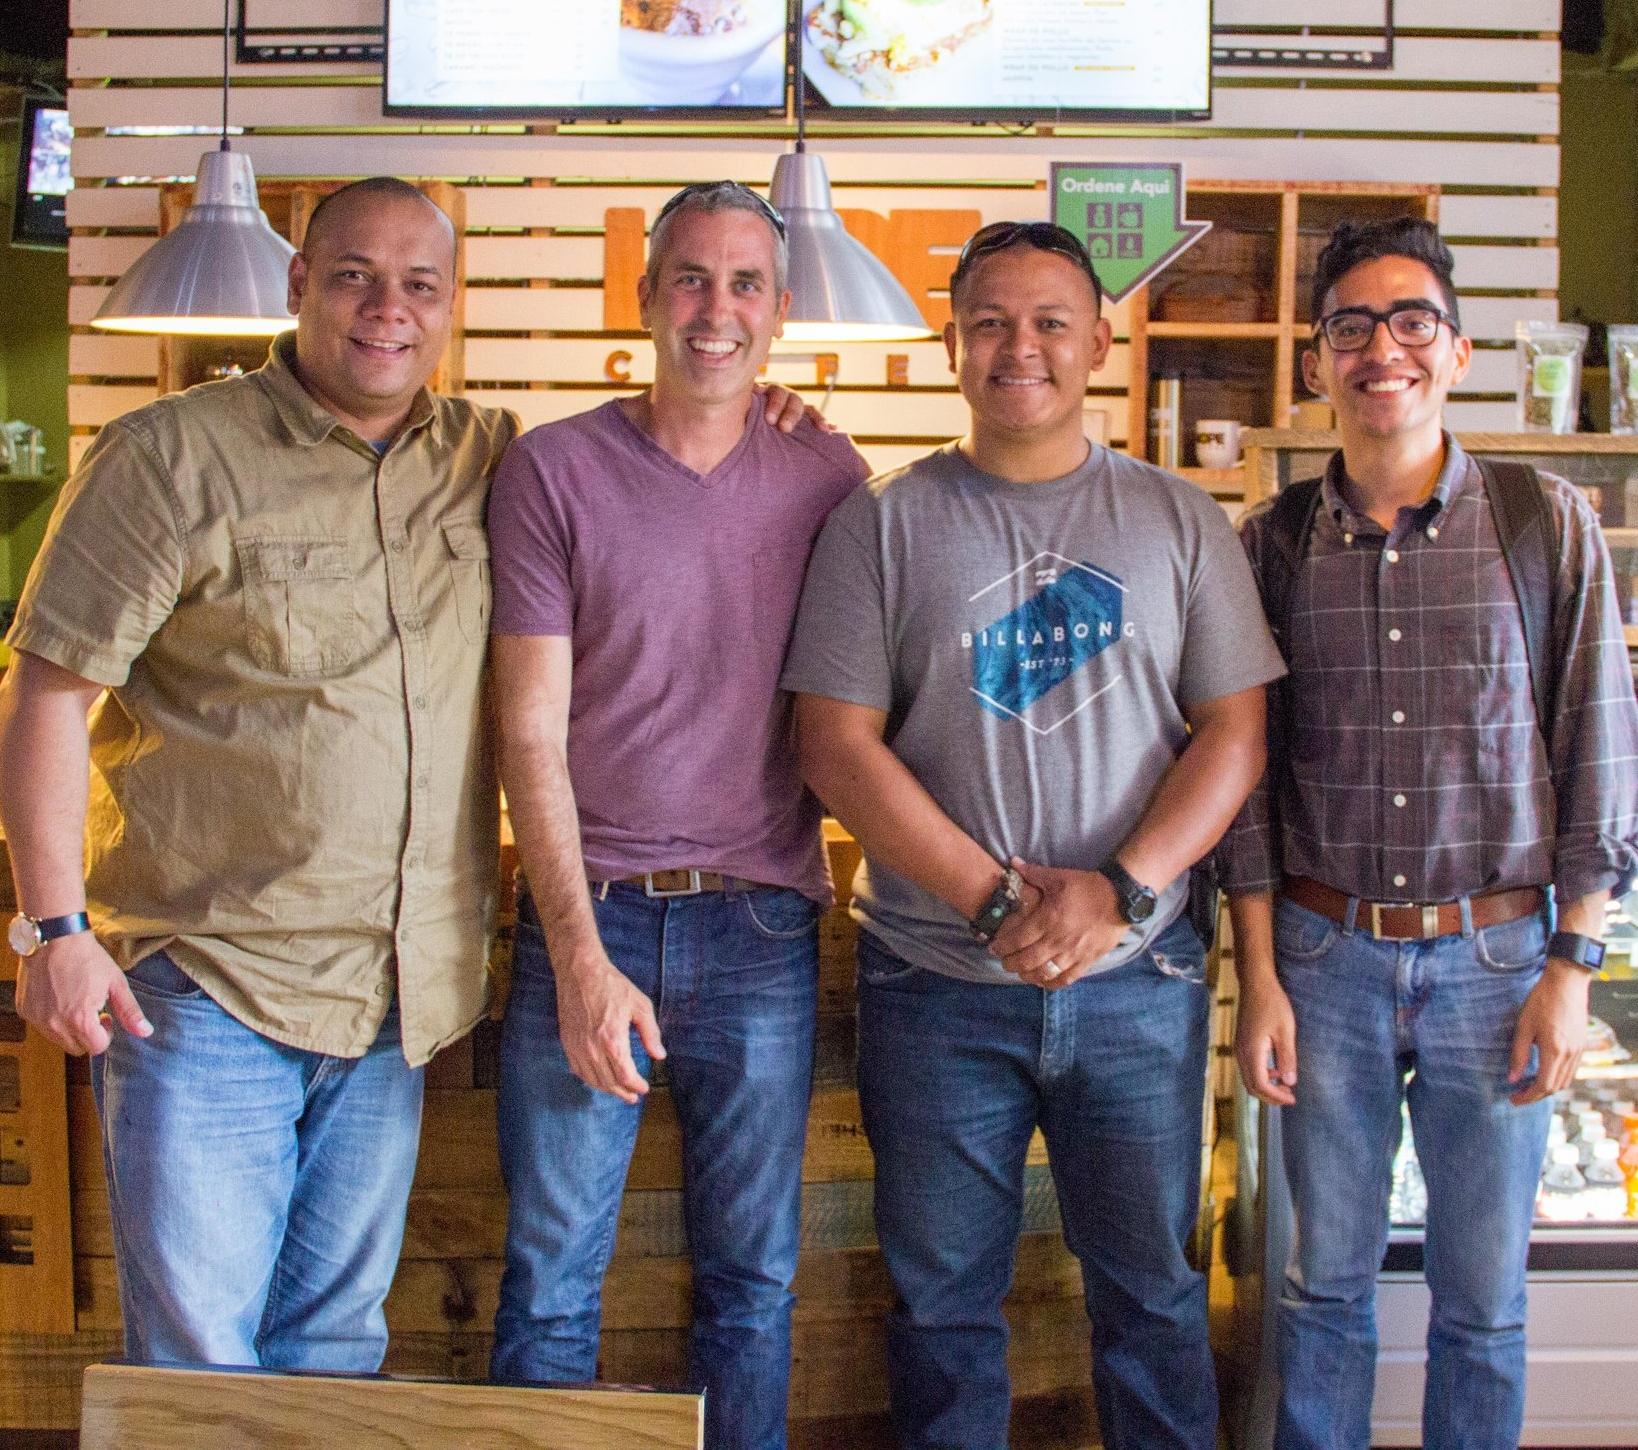 Cristian, Mark, Job, and Esteban, Model Farm Team